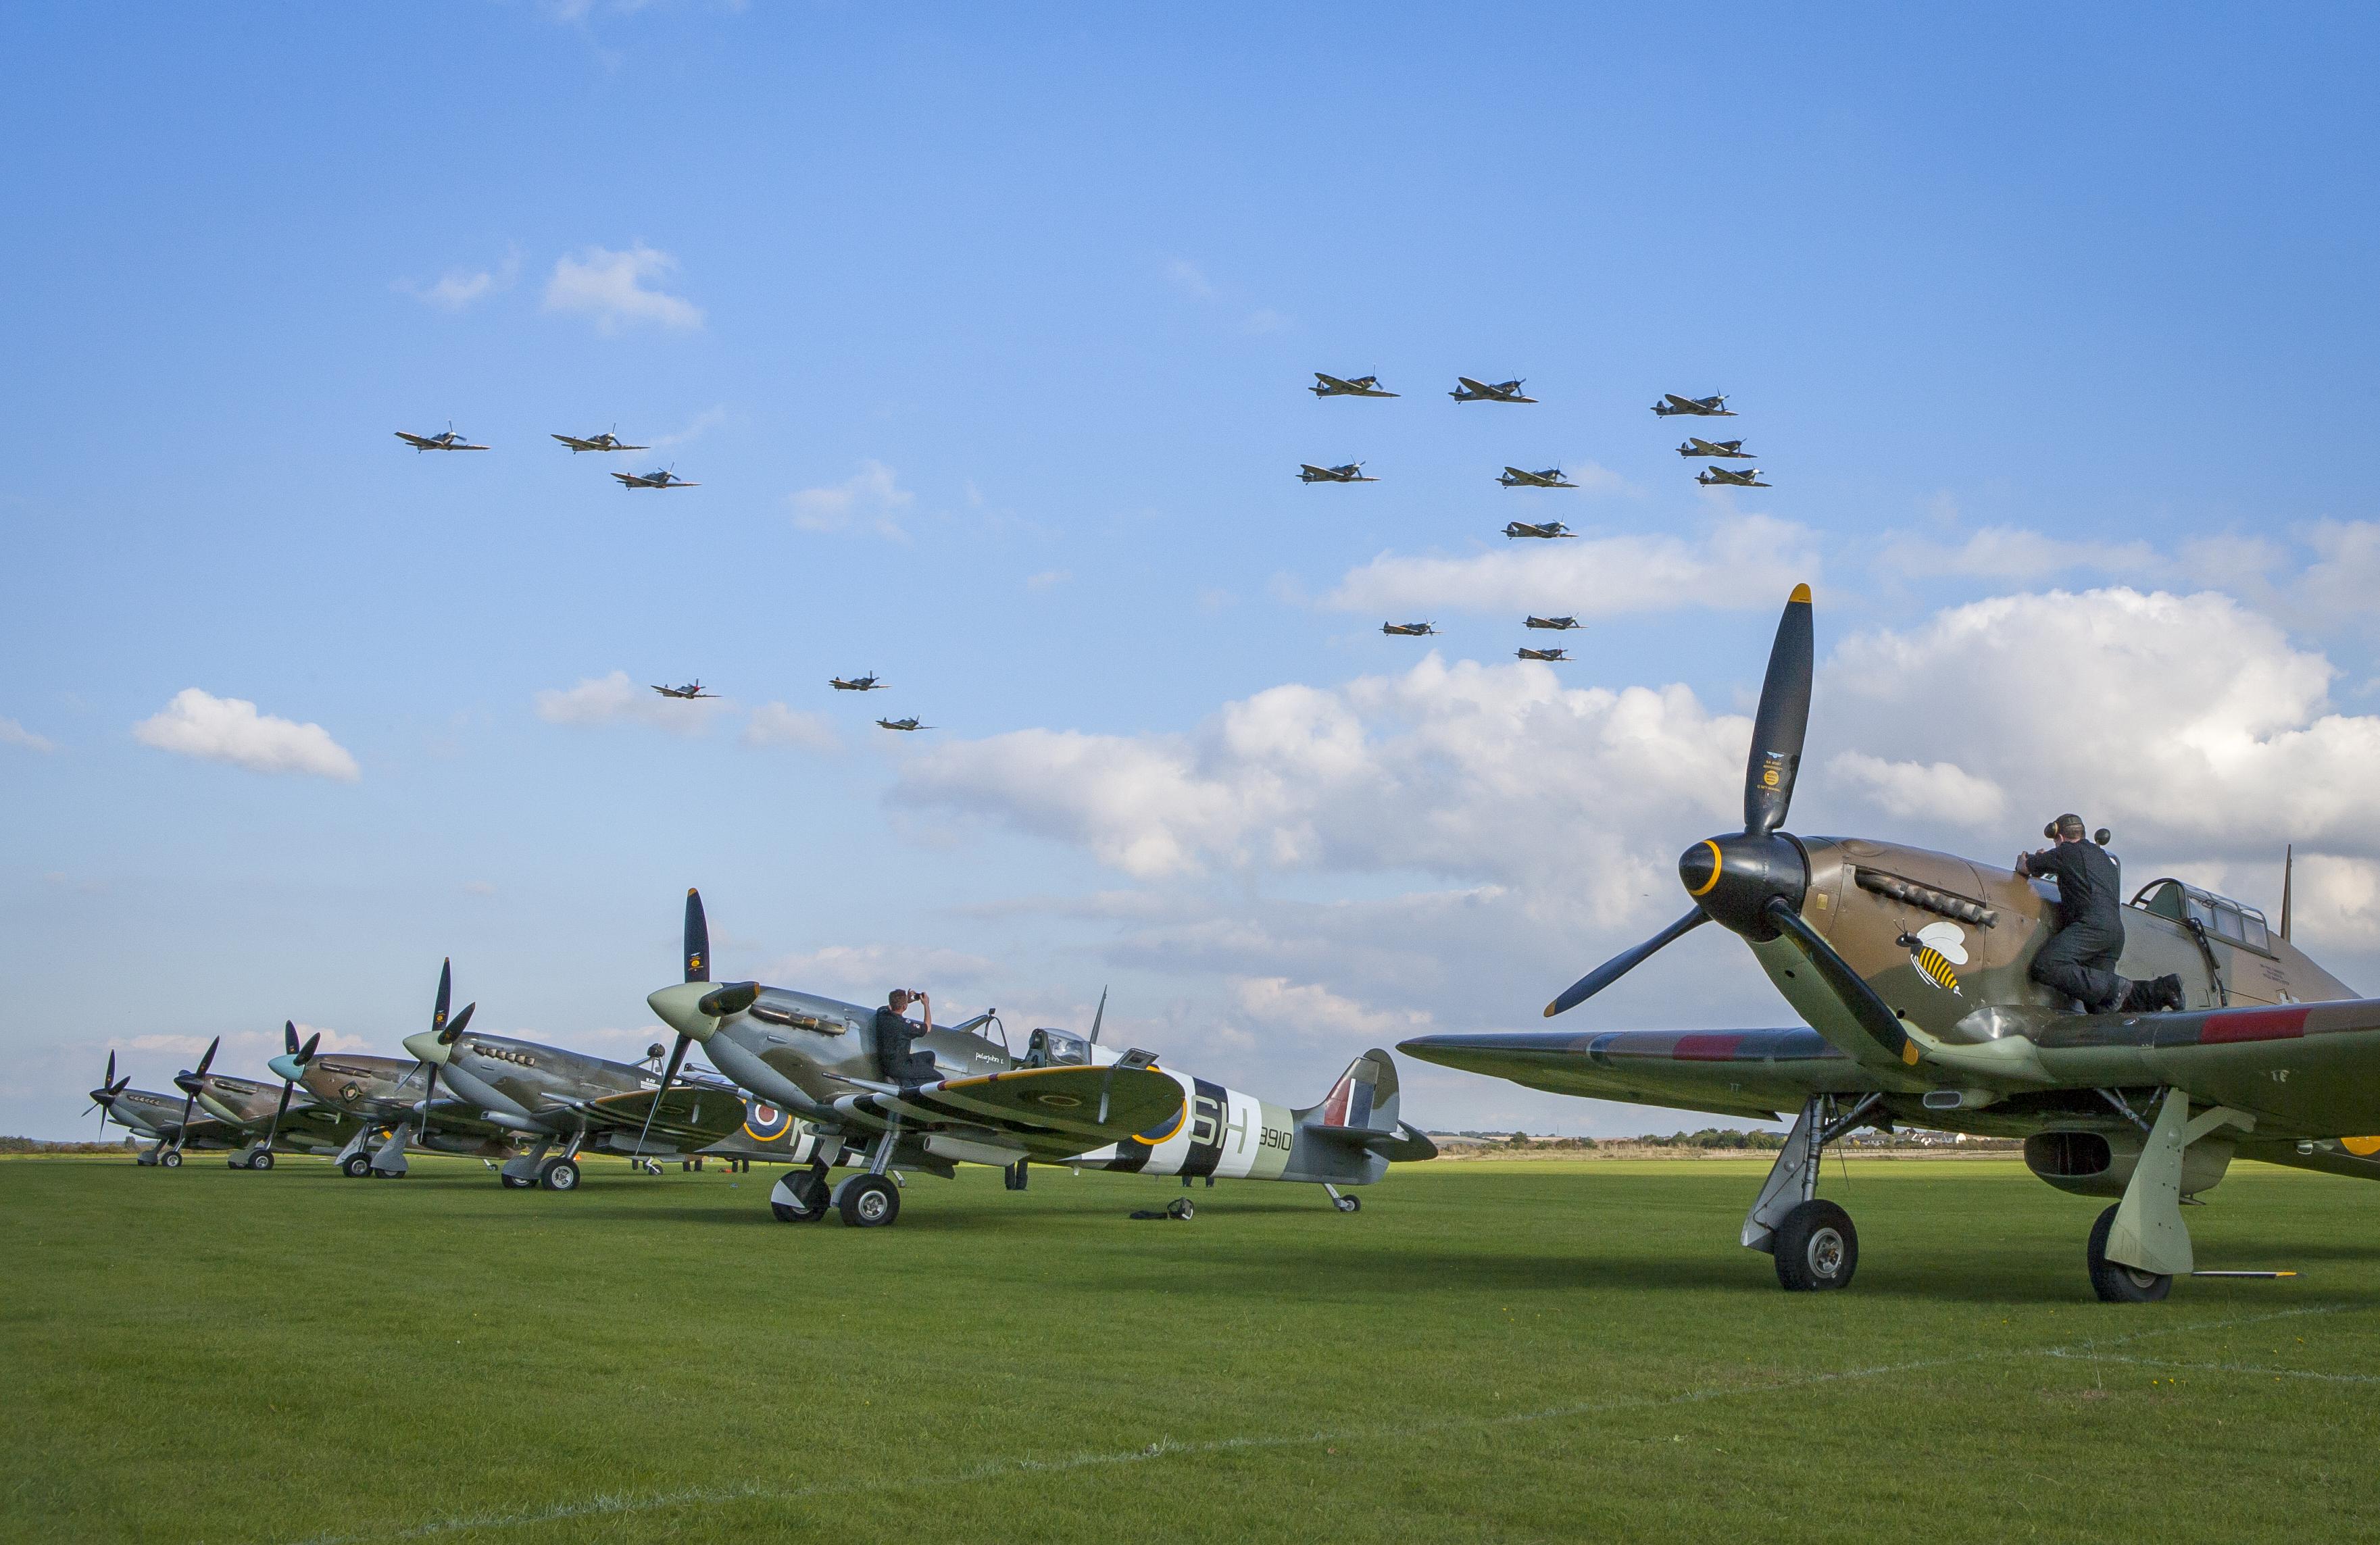 Spitfire Displays